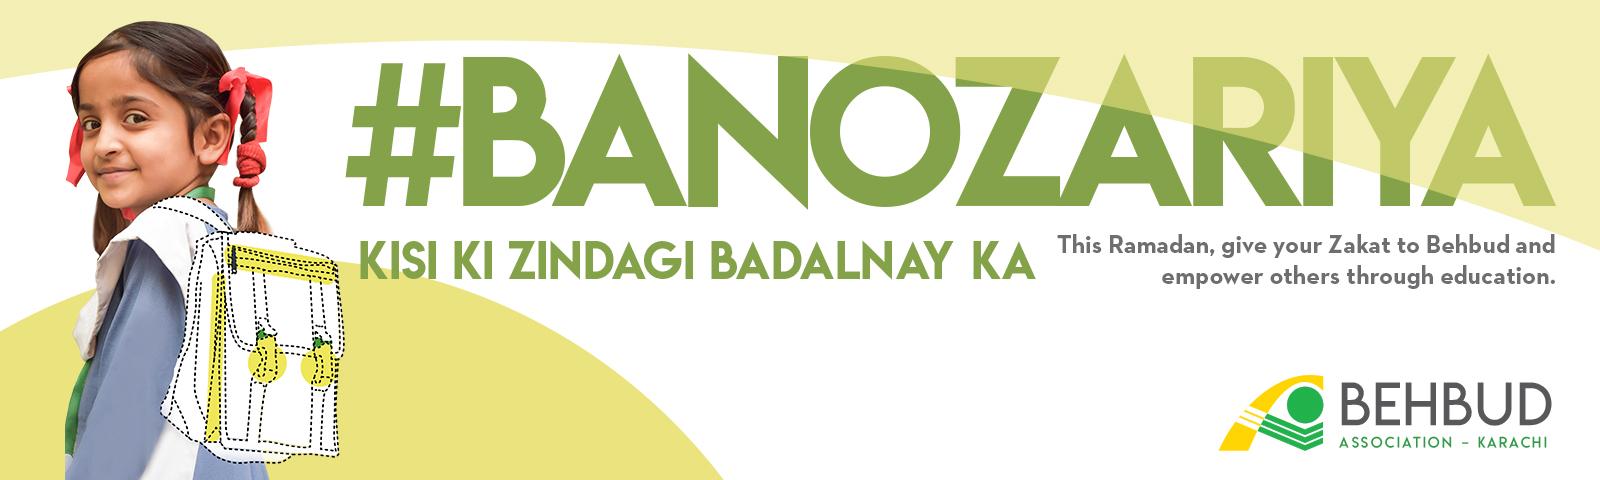 banozariya-ramadan-banner1